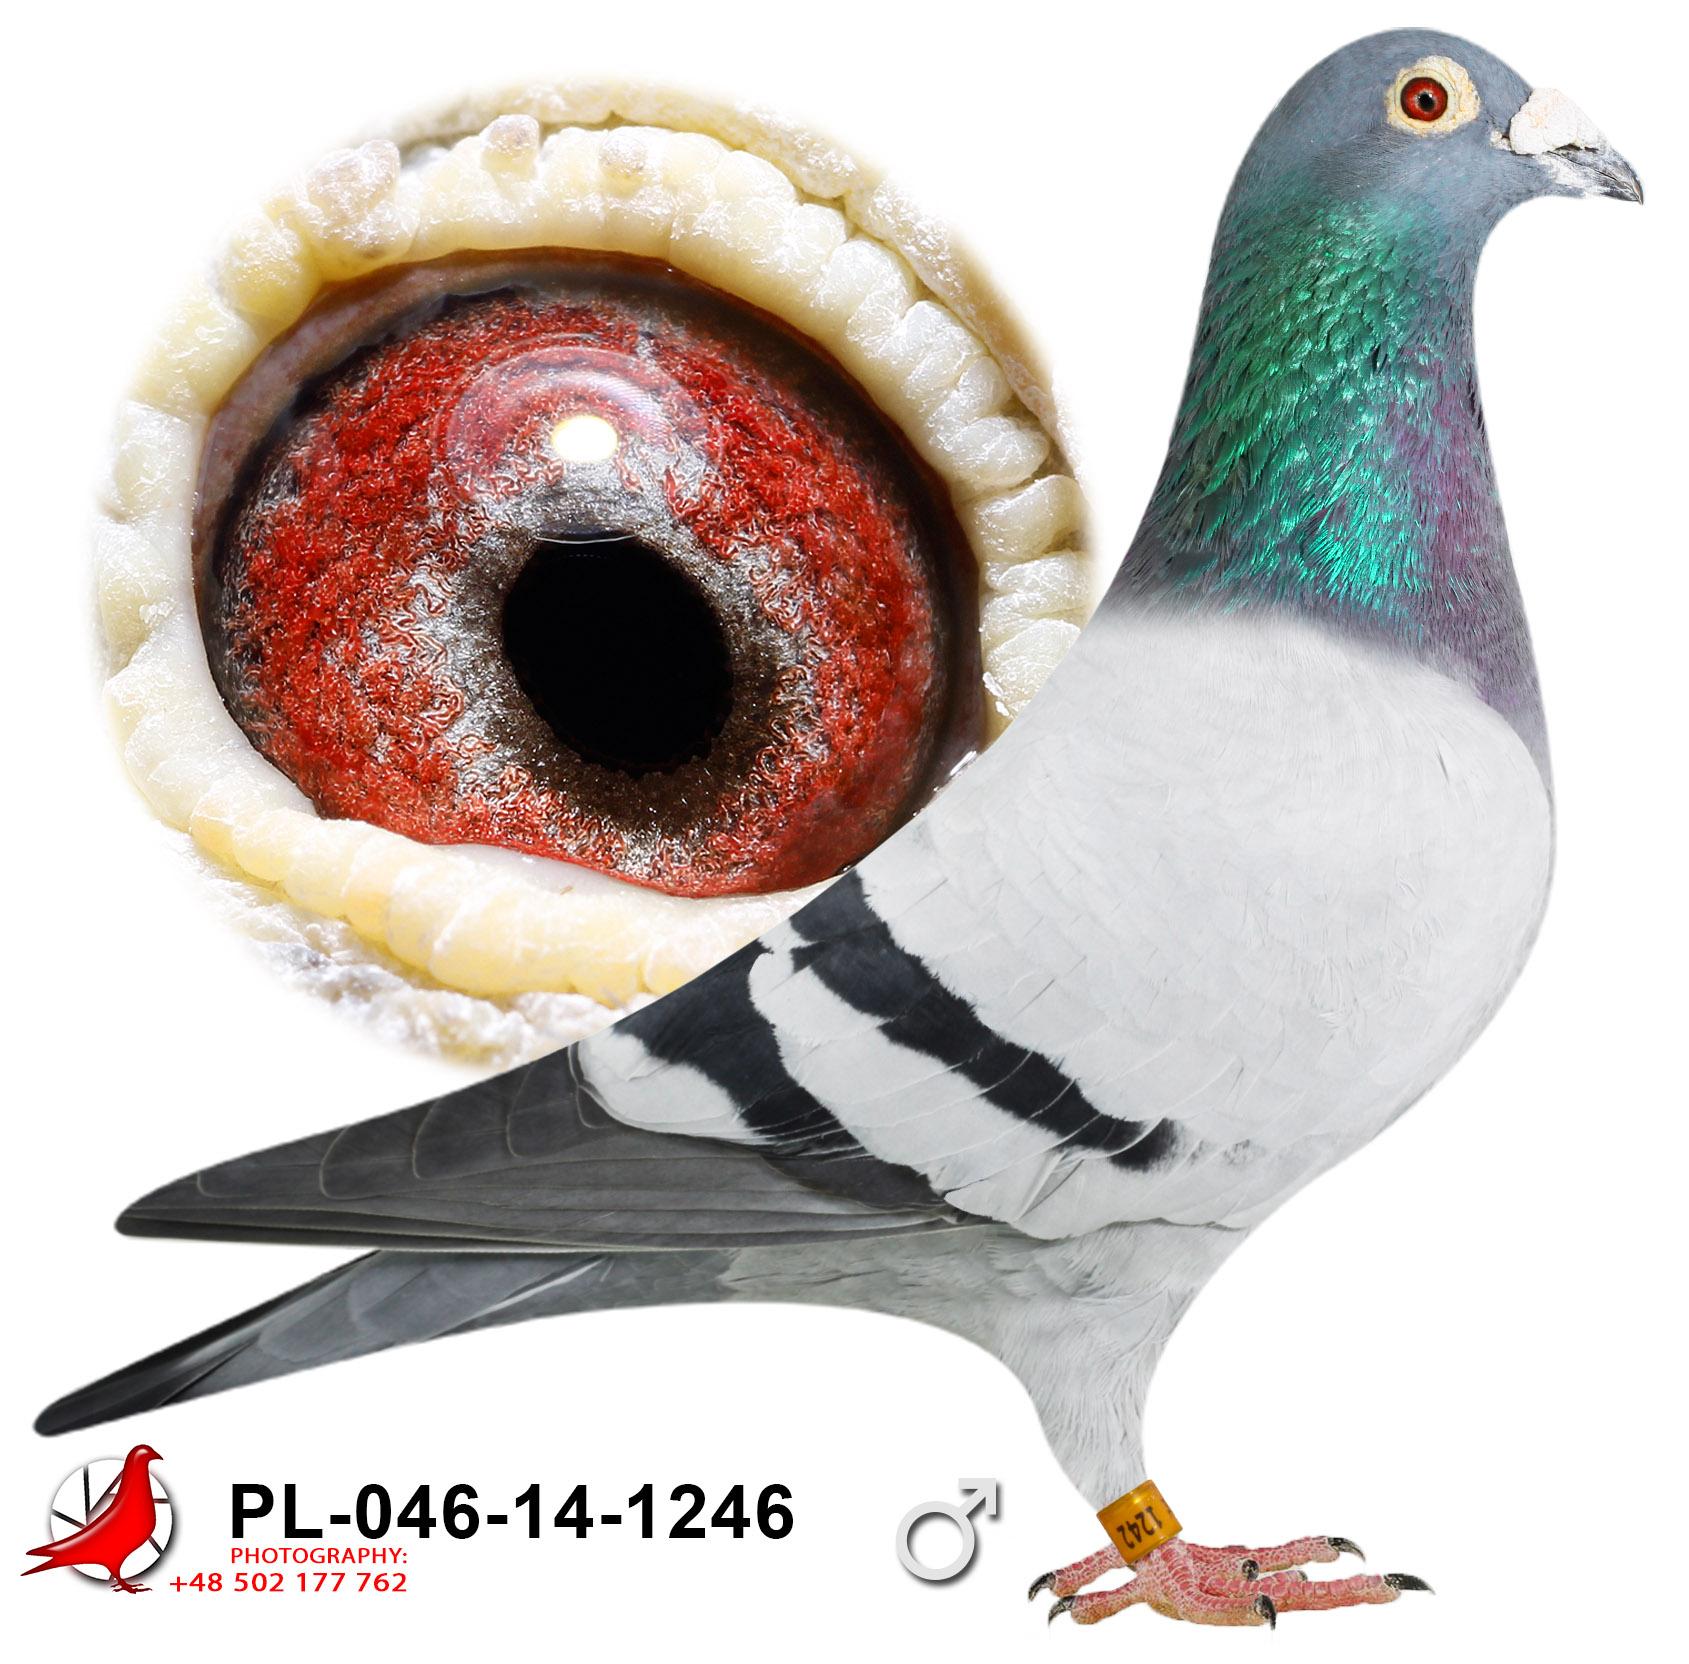 pl-046-14-1246_c